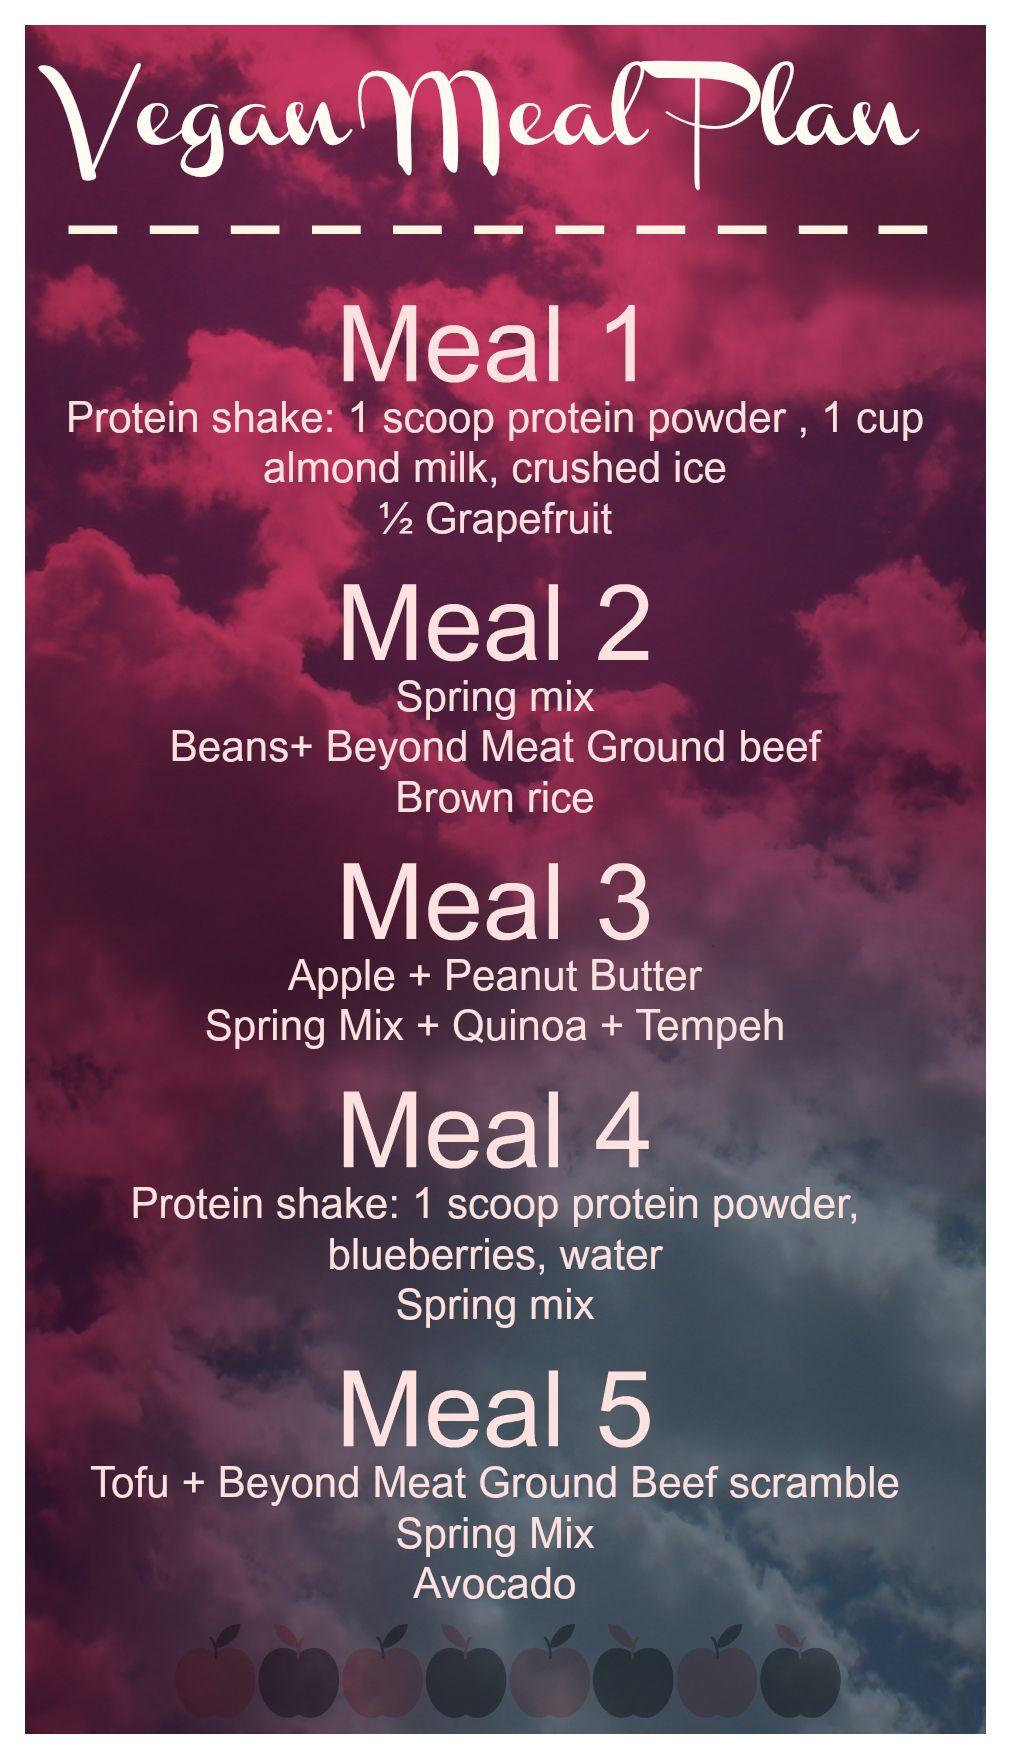 A vegan meal plan based off of 1450-1500 calories. #beyondmeat #vegan # mealplan #nutrirtion